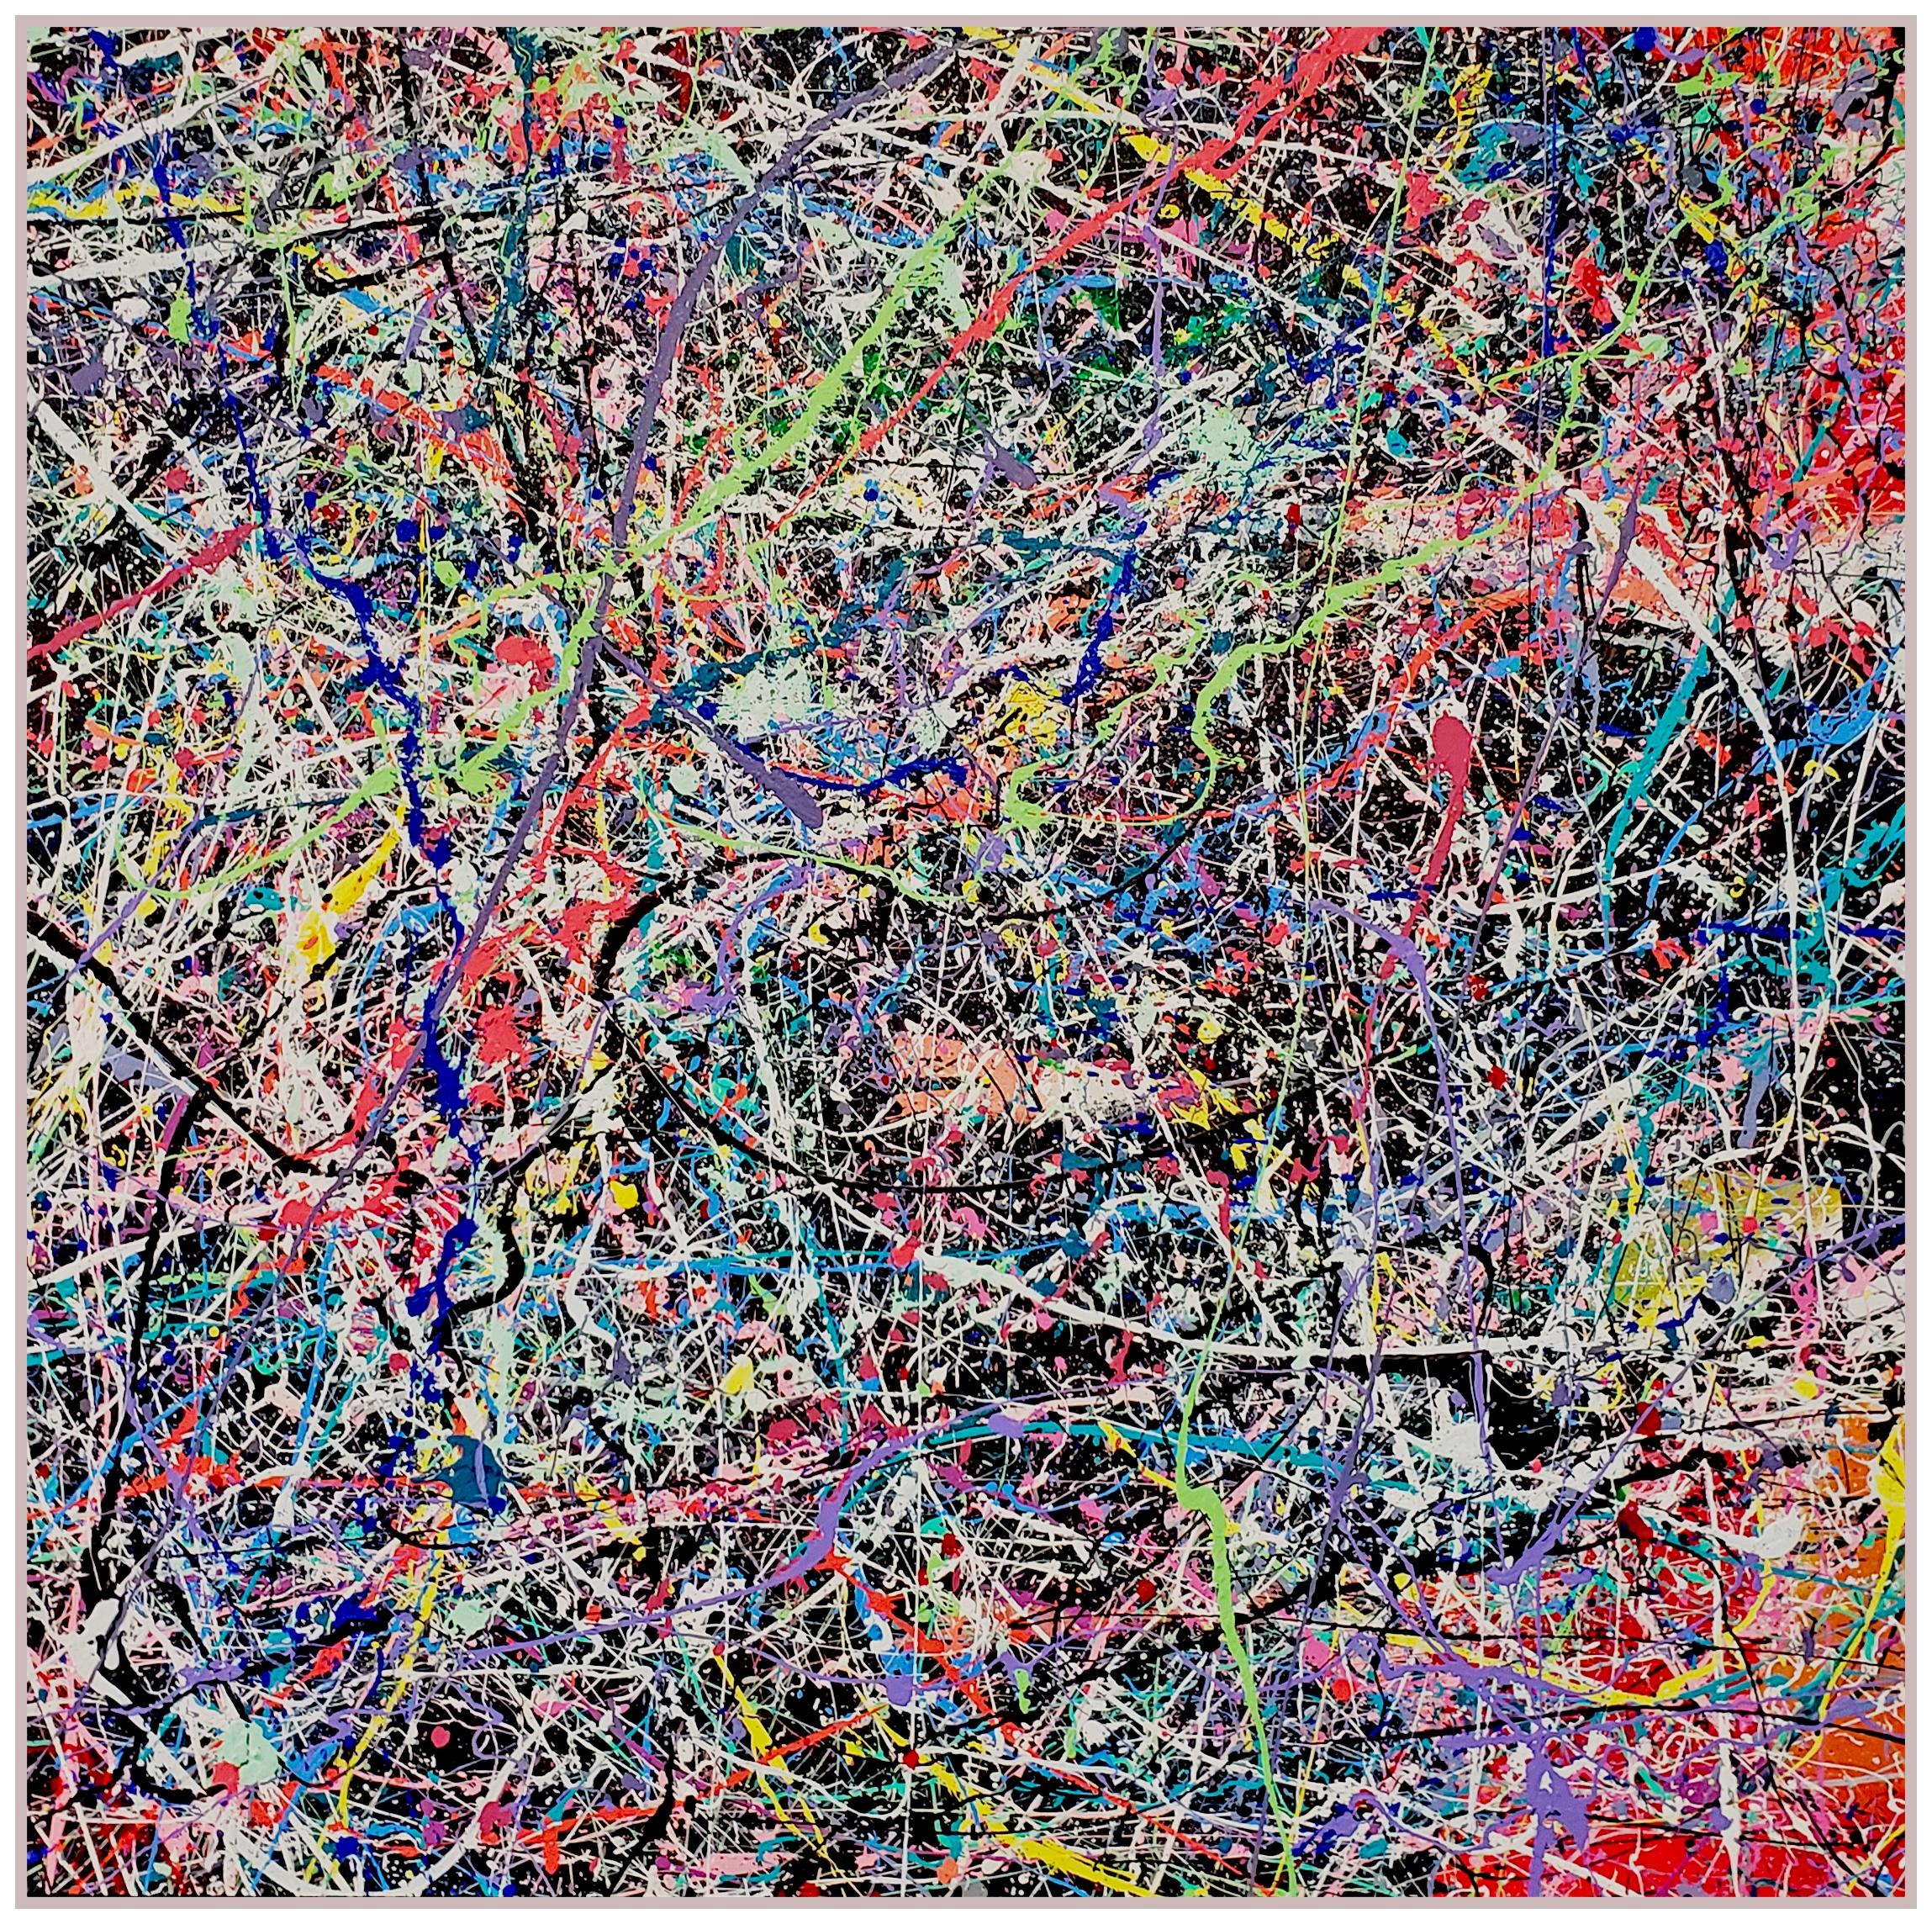 "Winter Paradise #23, 2019, acrylic on canvas, 48"" x 48"" (122 x 122 cm)"